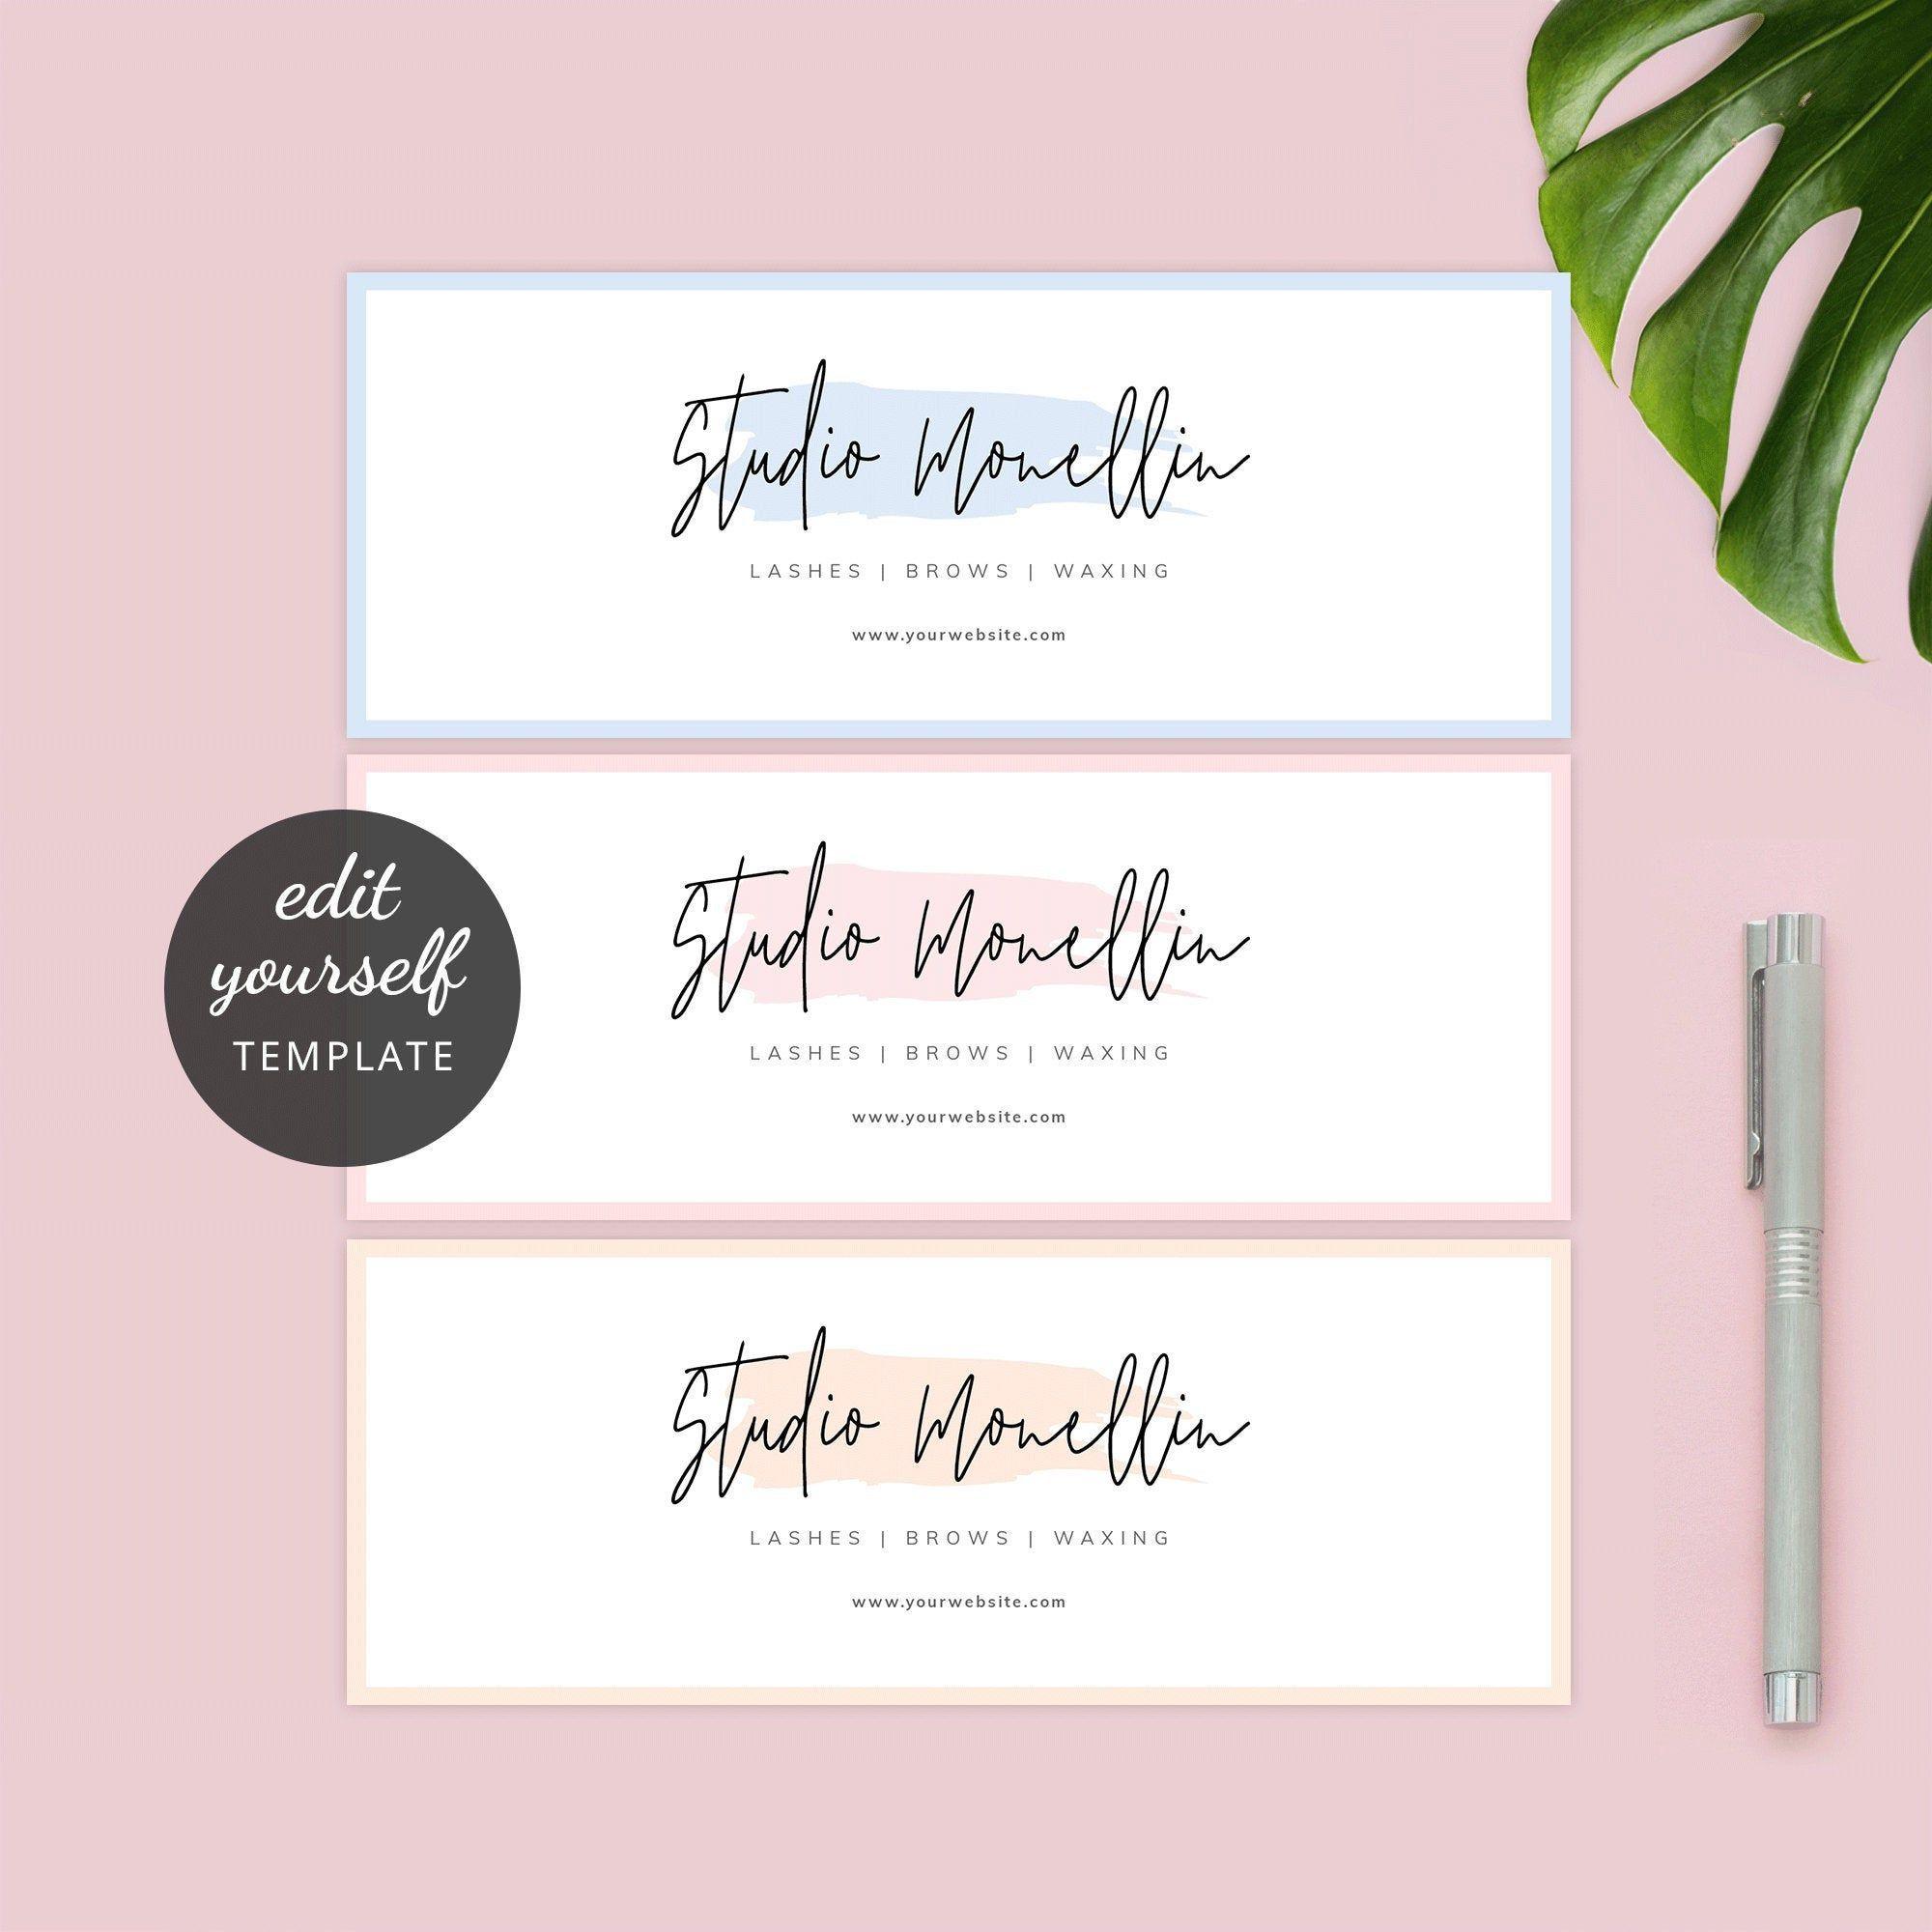 Editable Facebook Page Cover Template Diy Facebook Page Header Image Beauty Salon Fb Timeline Cover Letterhead Design Letterhead Template Cover Photo Design